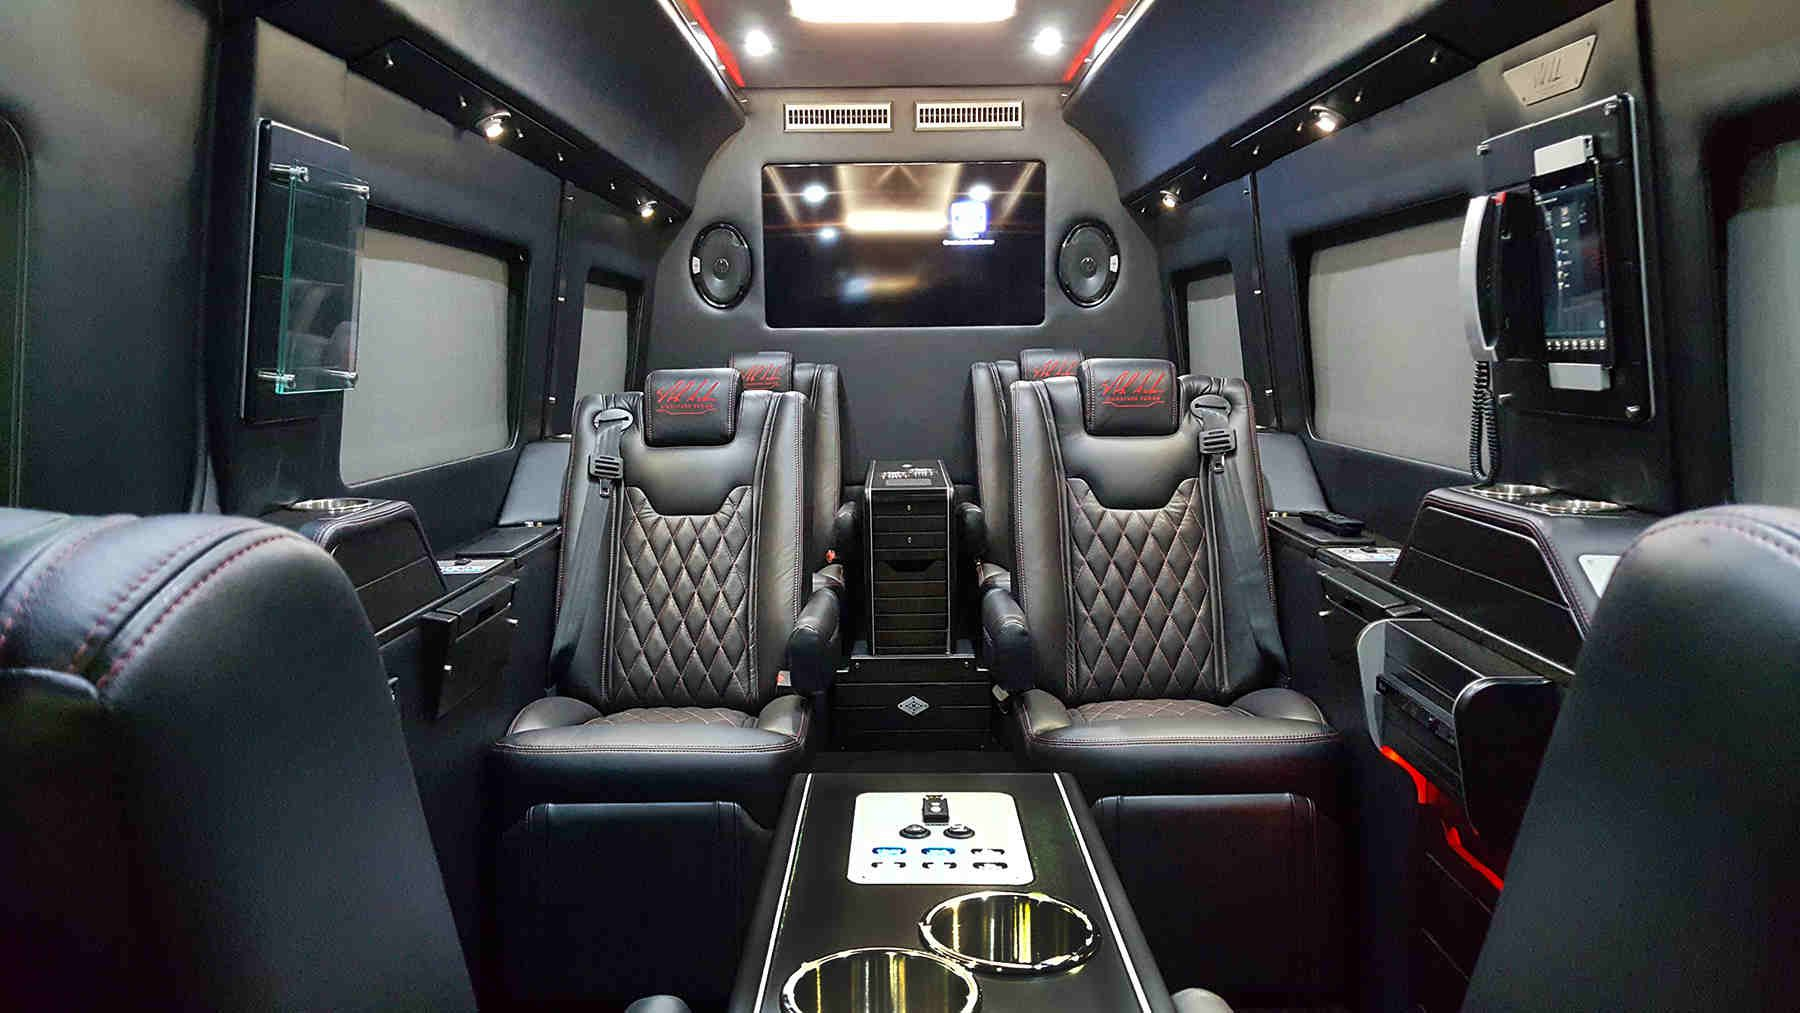 Nick Saban Pimps Up Mercedes Benz Sprinter Interior